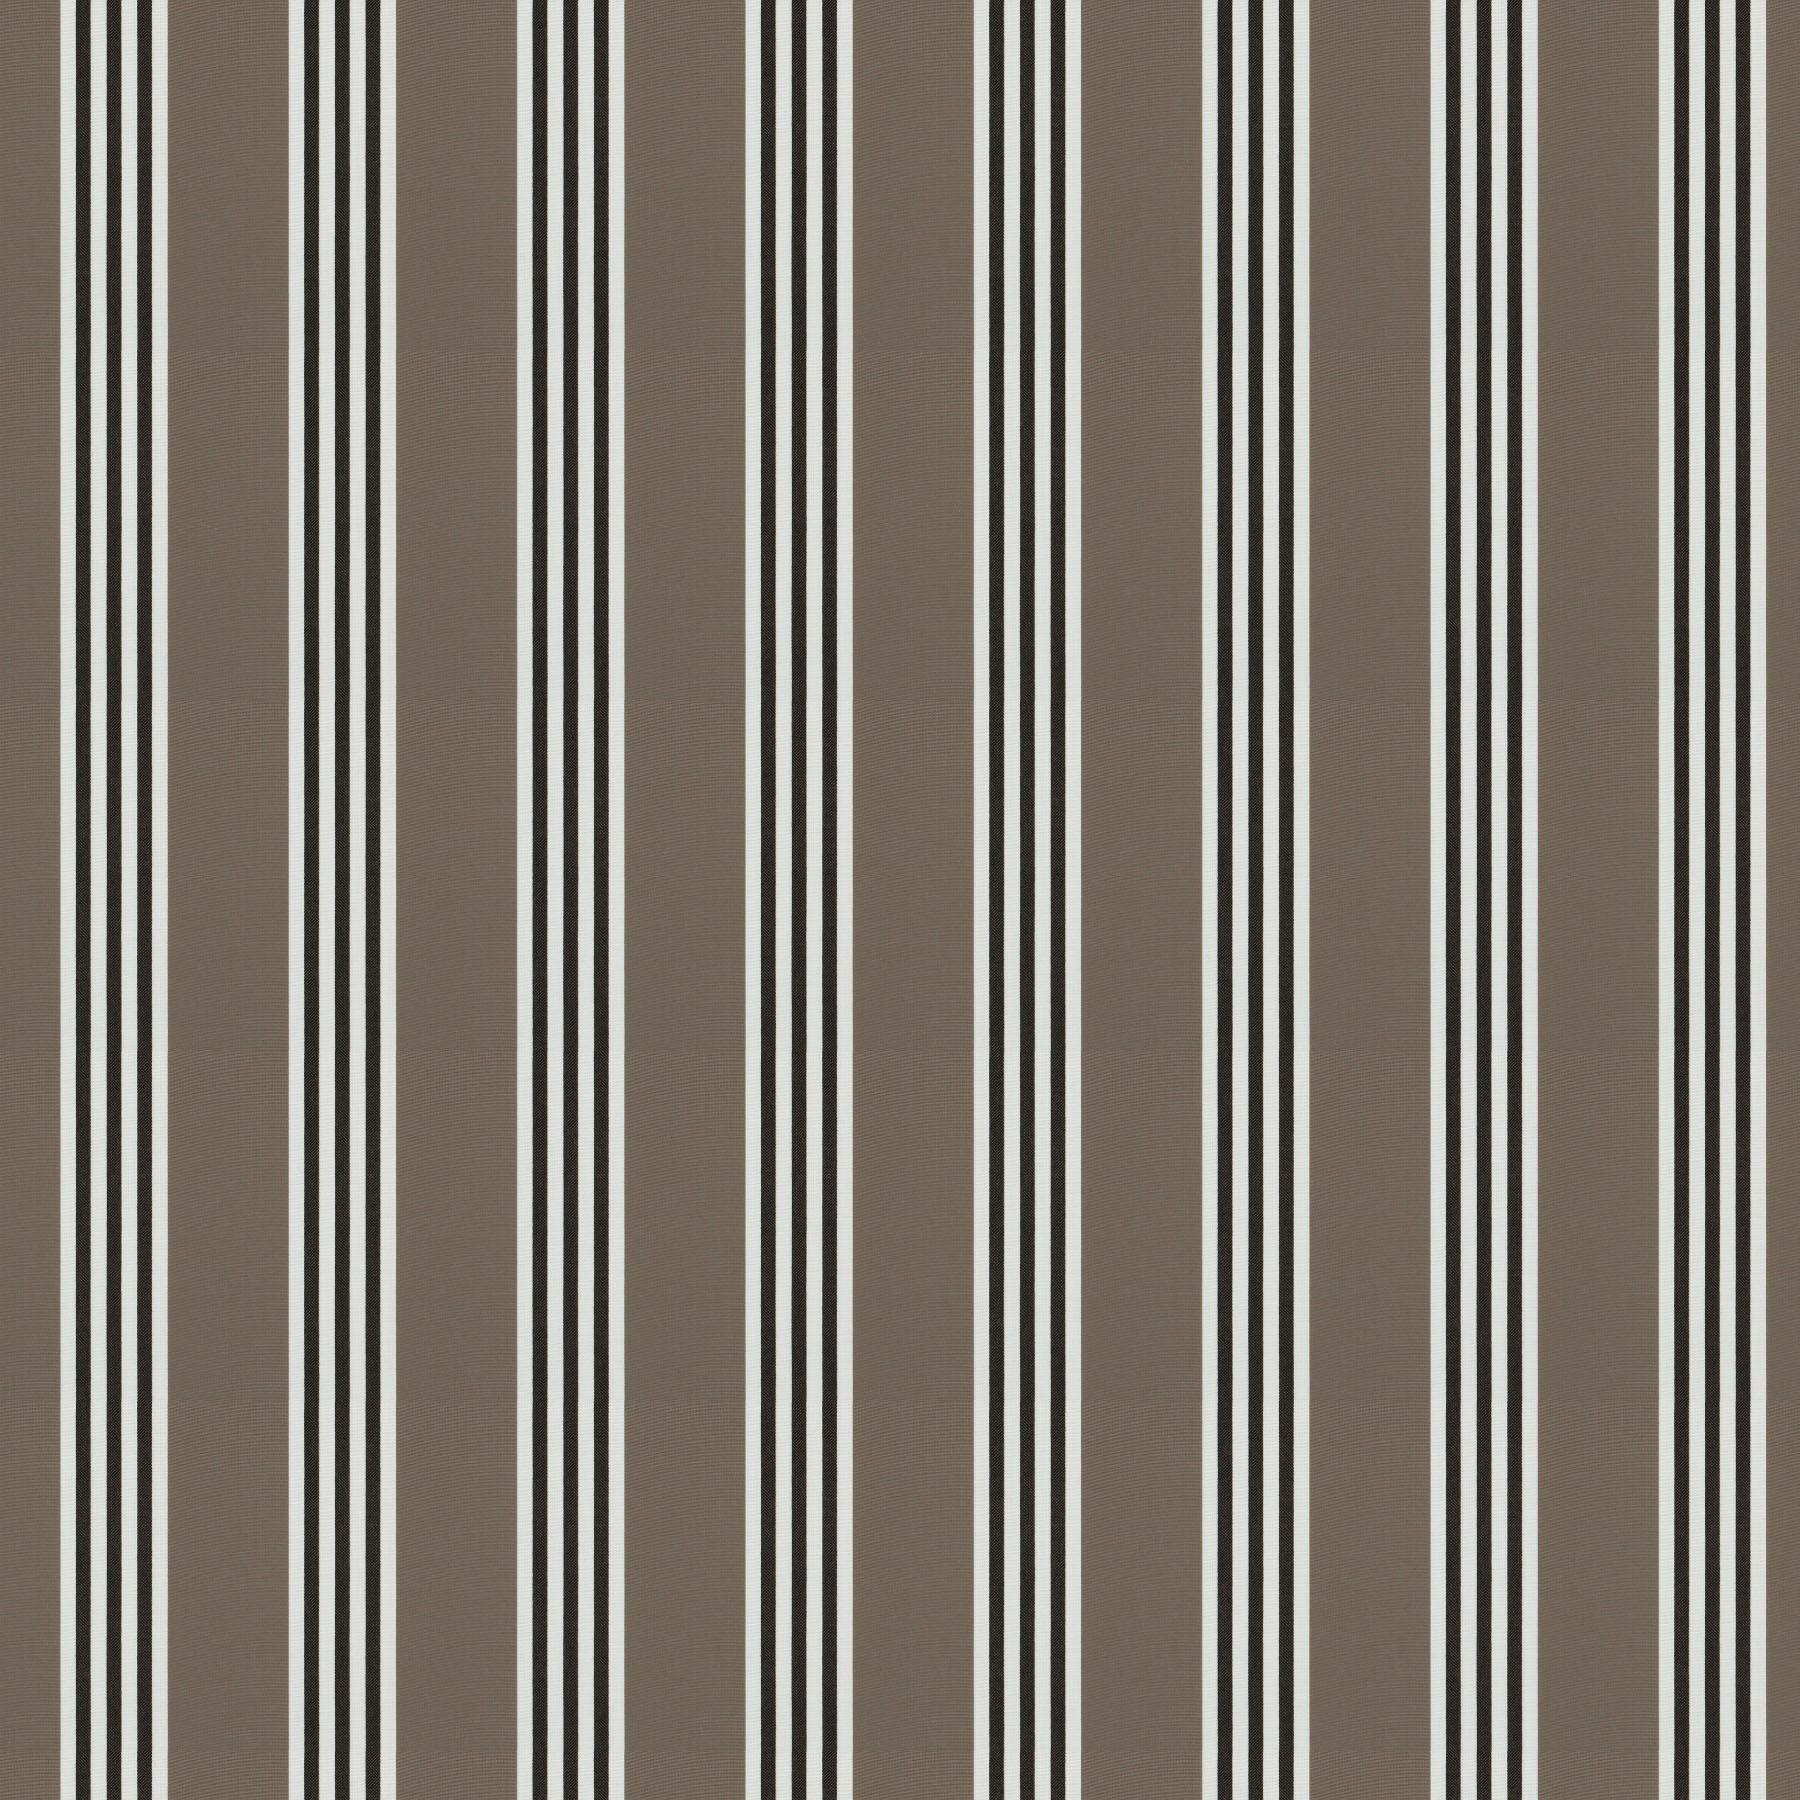 Upholstery Fabric Limit 9 2130 020 Jab Anstoetz Fabrics